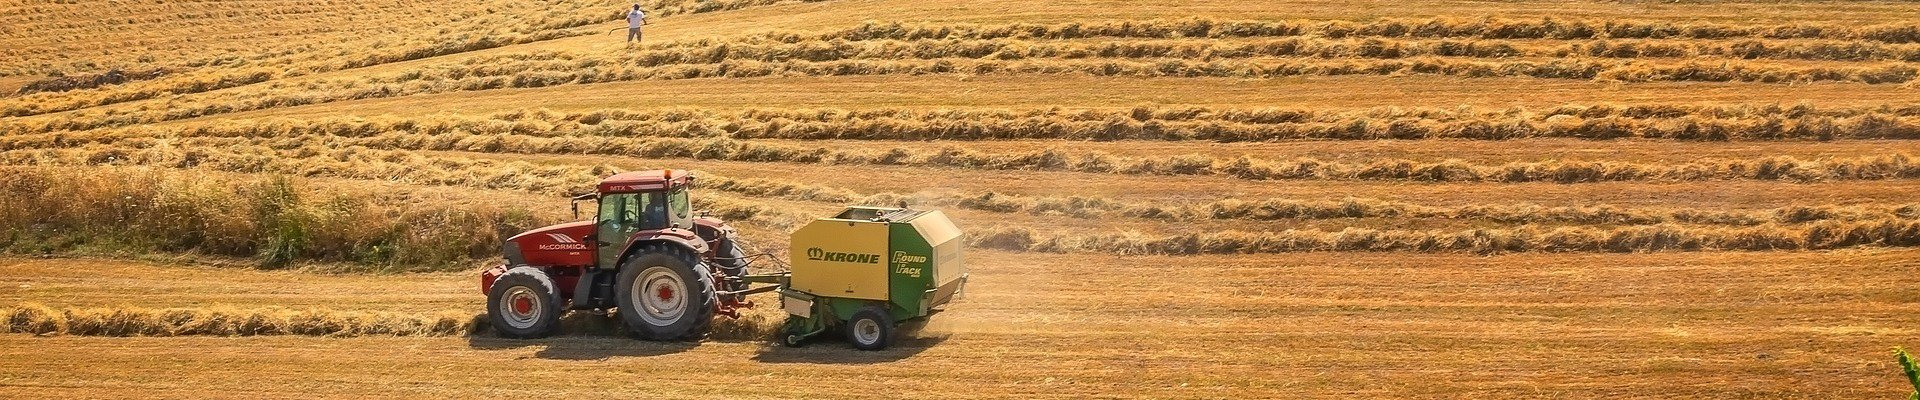 Traktor Versicherung BestensVersichert.at